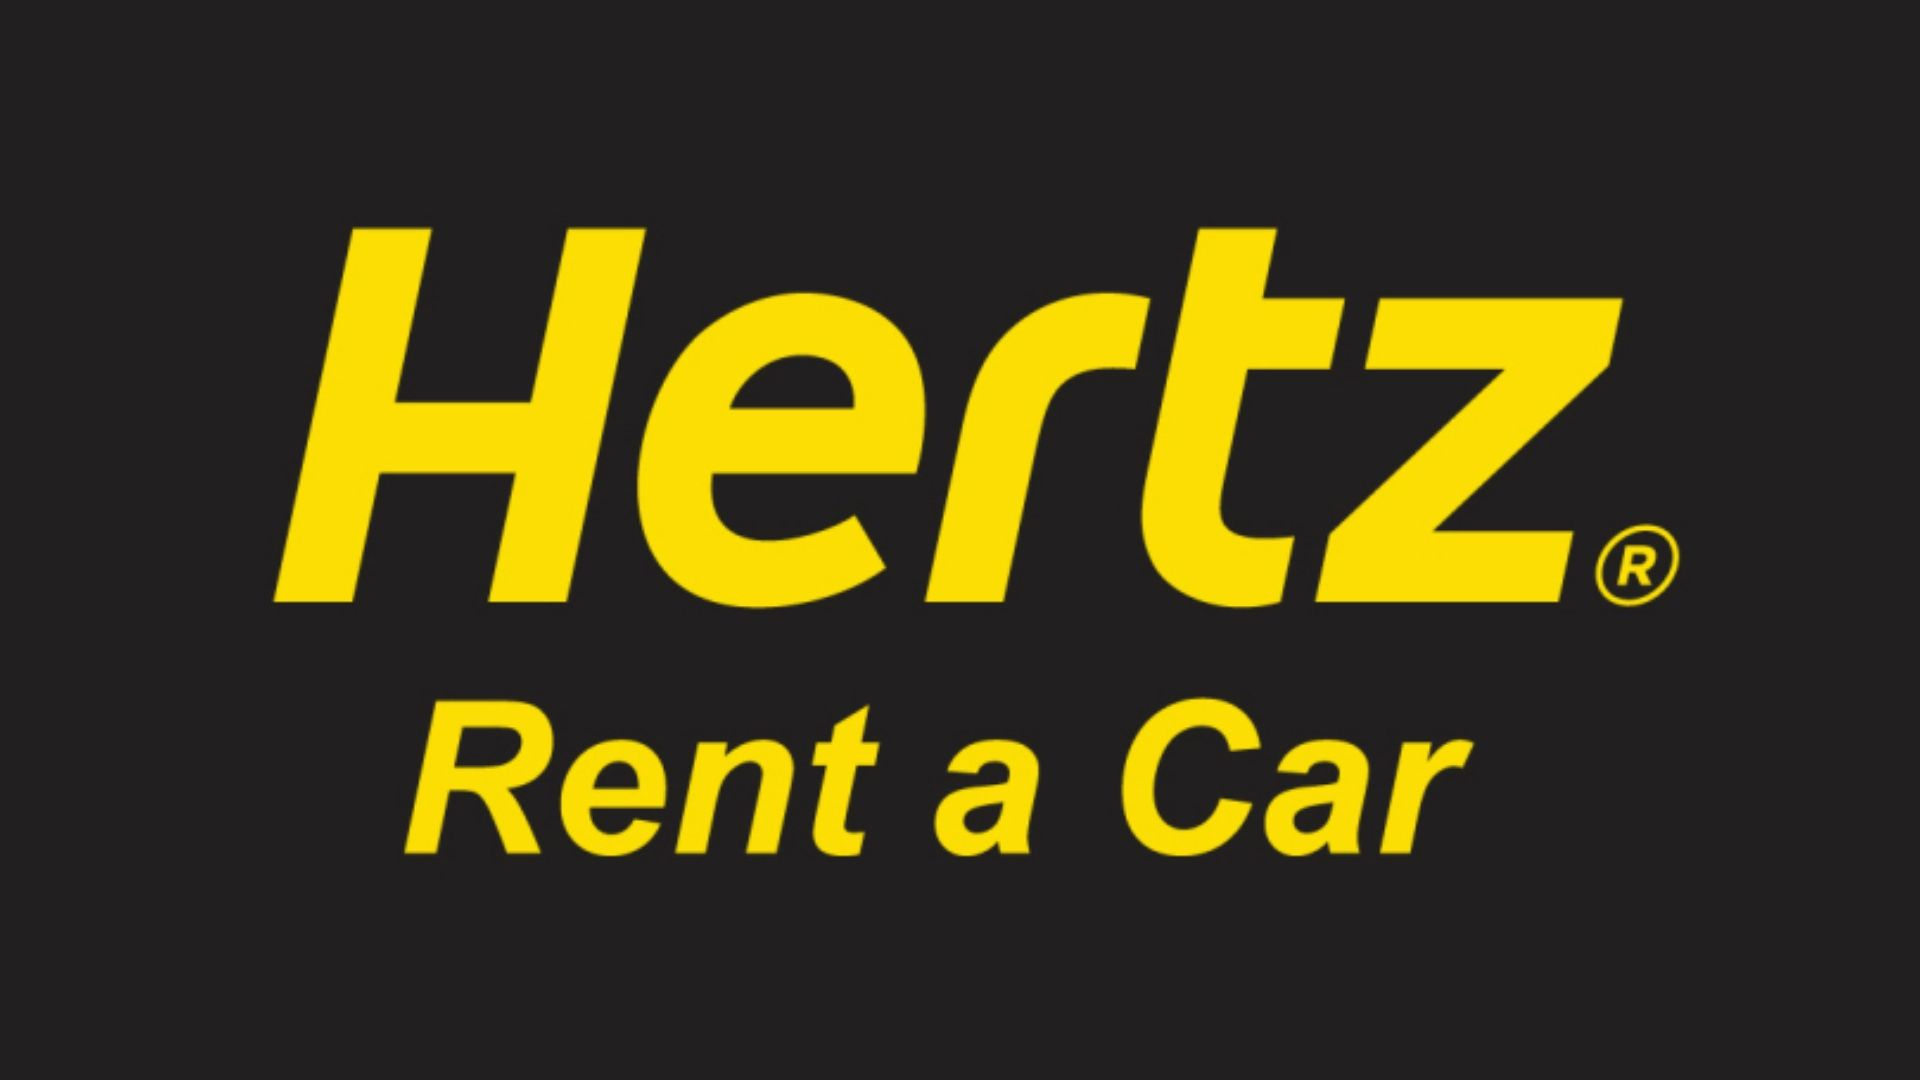 Hertz Customer Service Numbers Hertz Car Rental Car Rental Sell Car